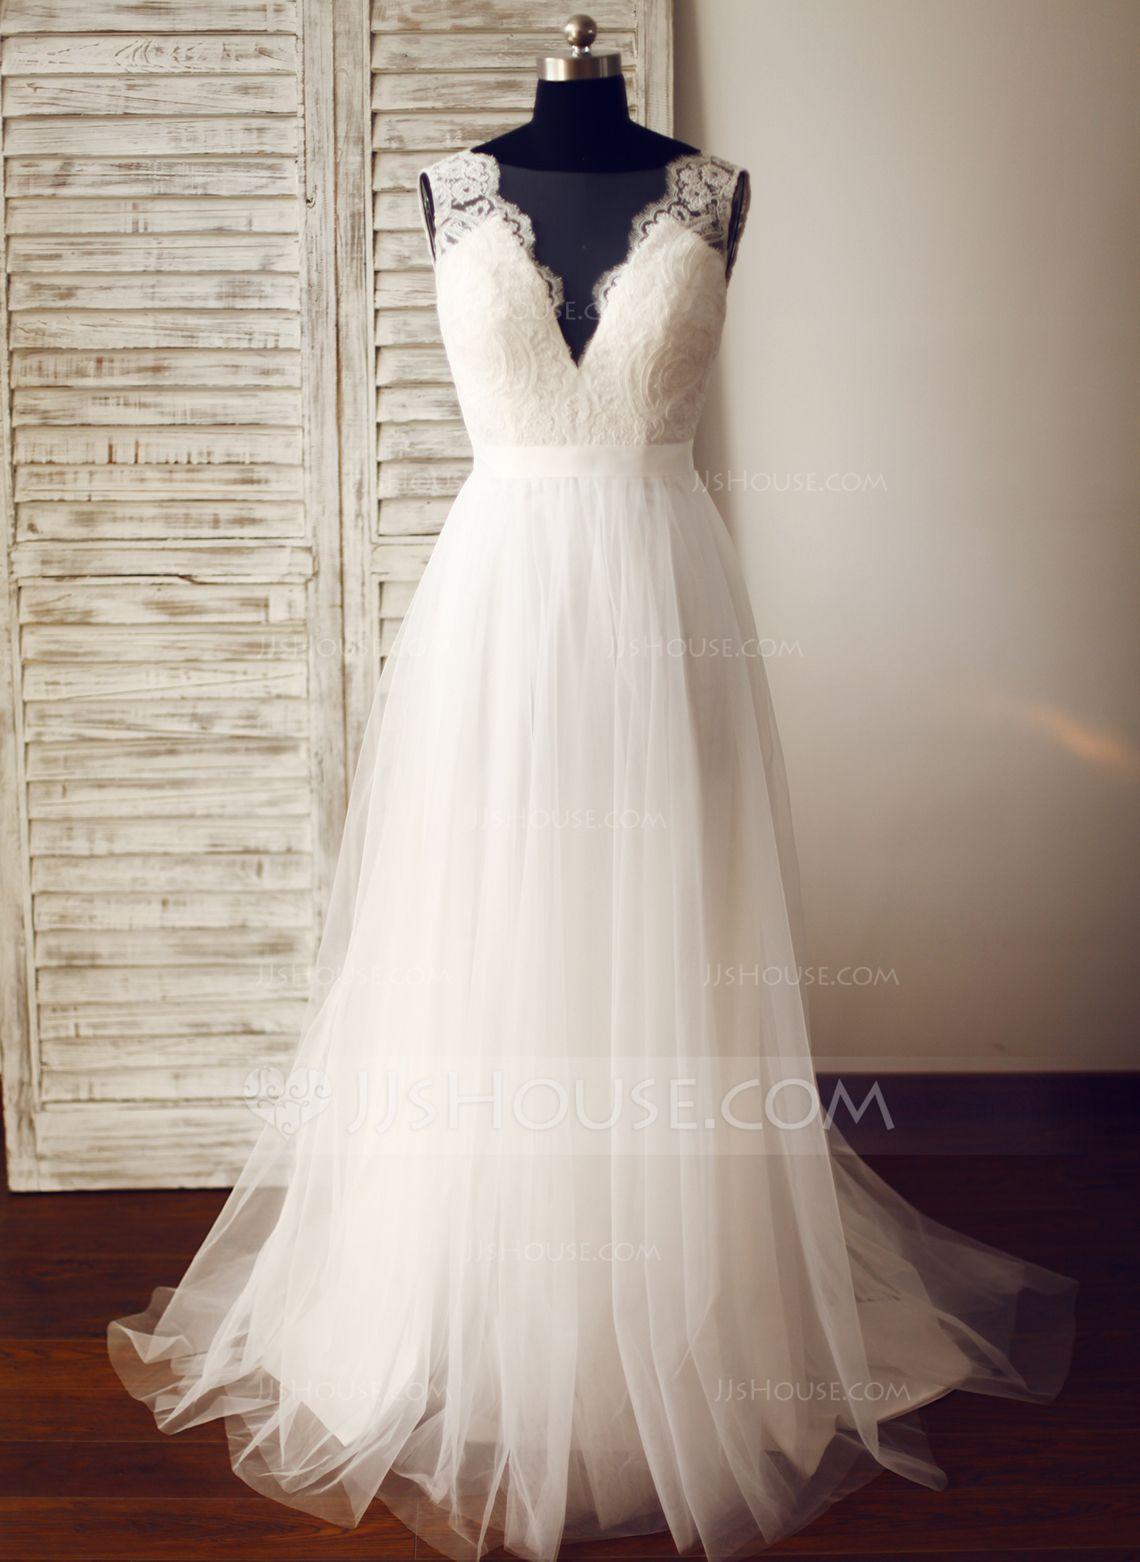 190 00 A Line Princess V Neck Sweep Train Tulle Wedding Dress Jj S House Wedding Dresses Sweep Train Wedding Dress Tulle Wedding Dress [ 1562 x 1140 Pixel ]